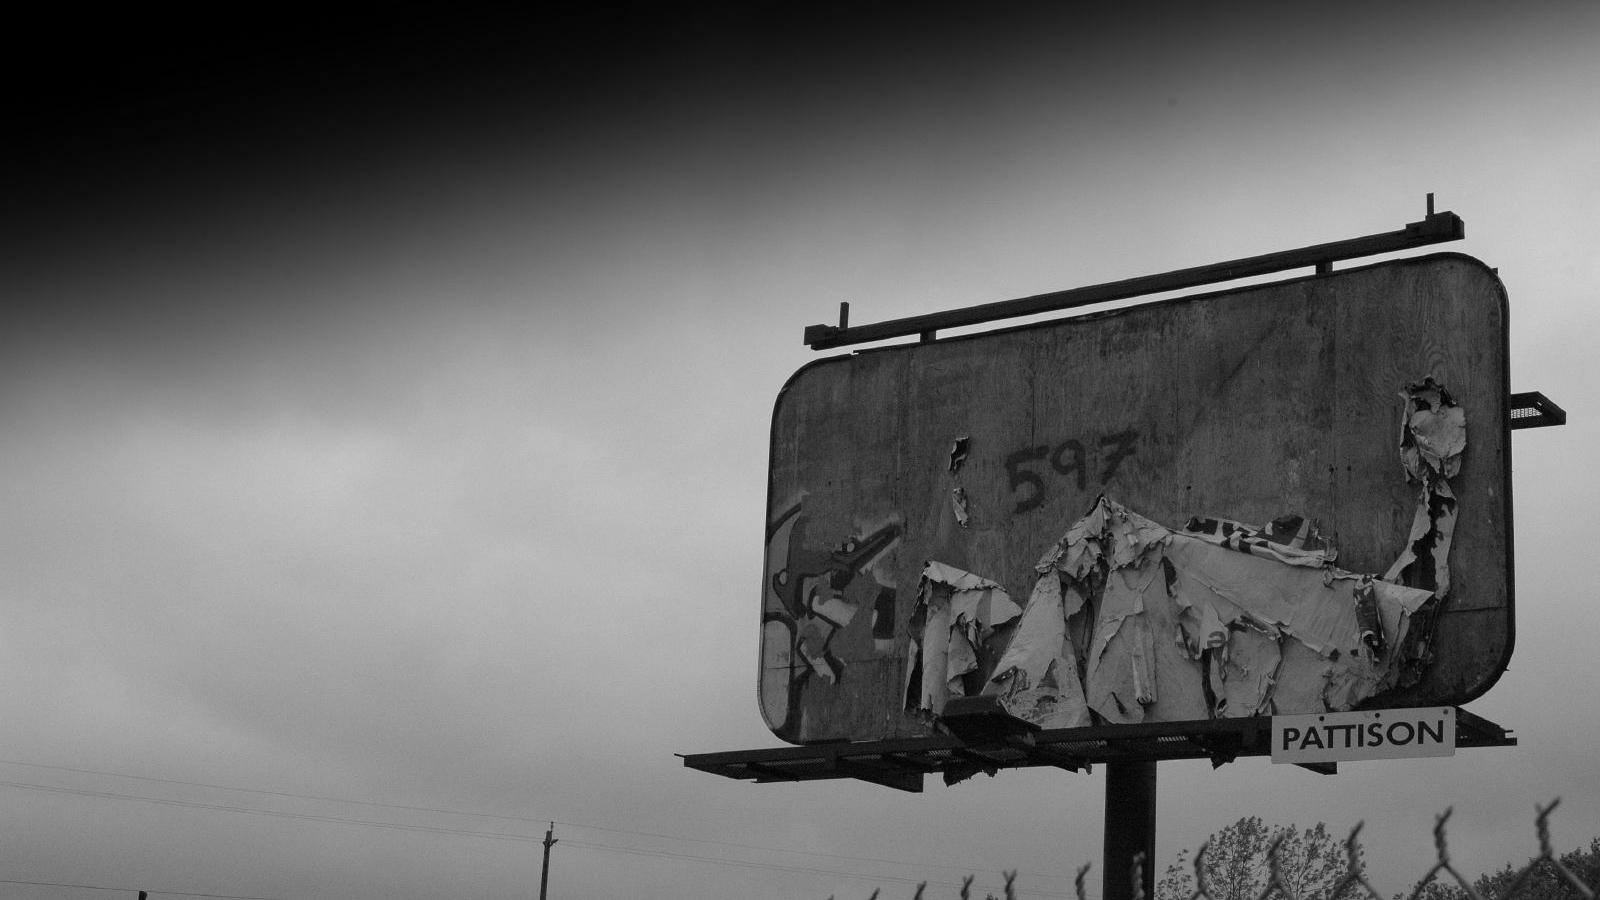 billboard hedge fund advertising